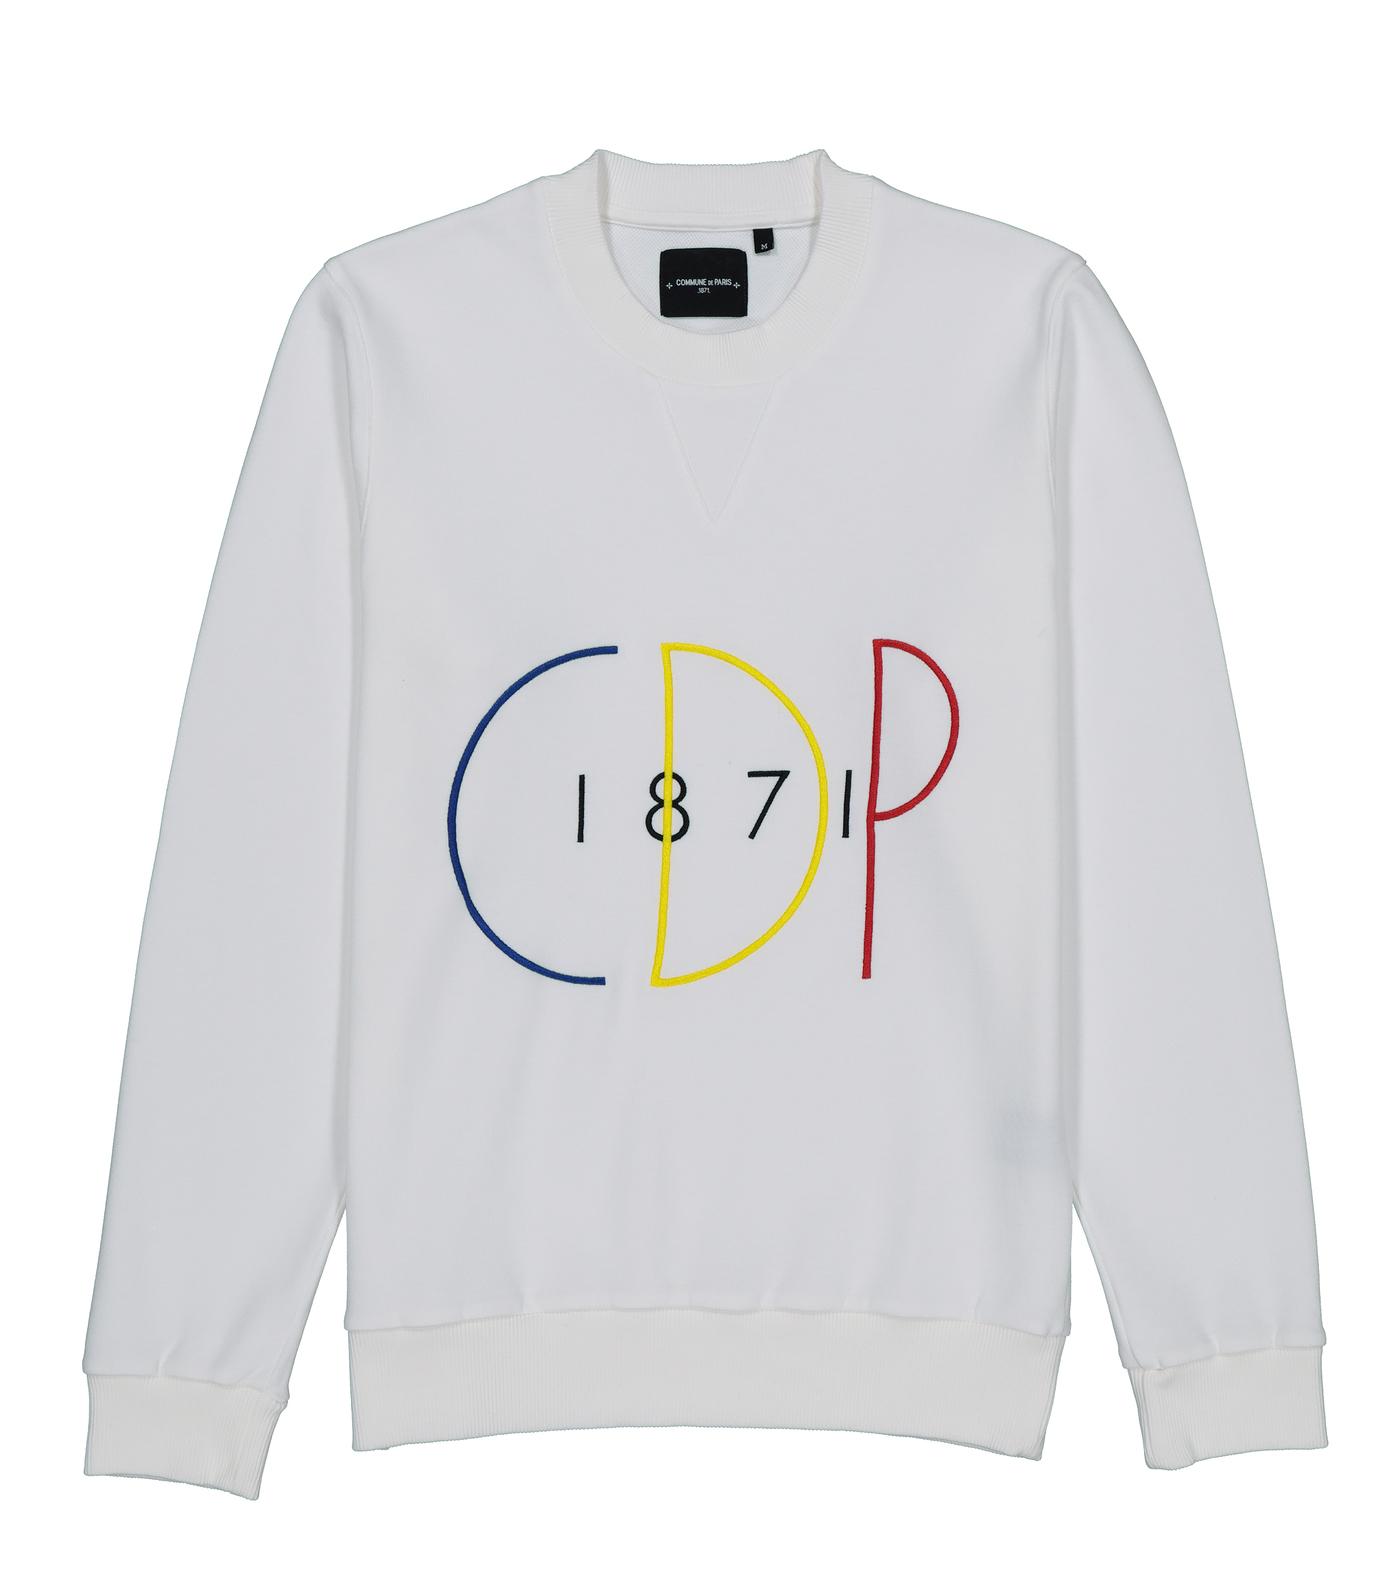 SWEAT CDP 1871 - Ivory